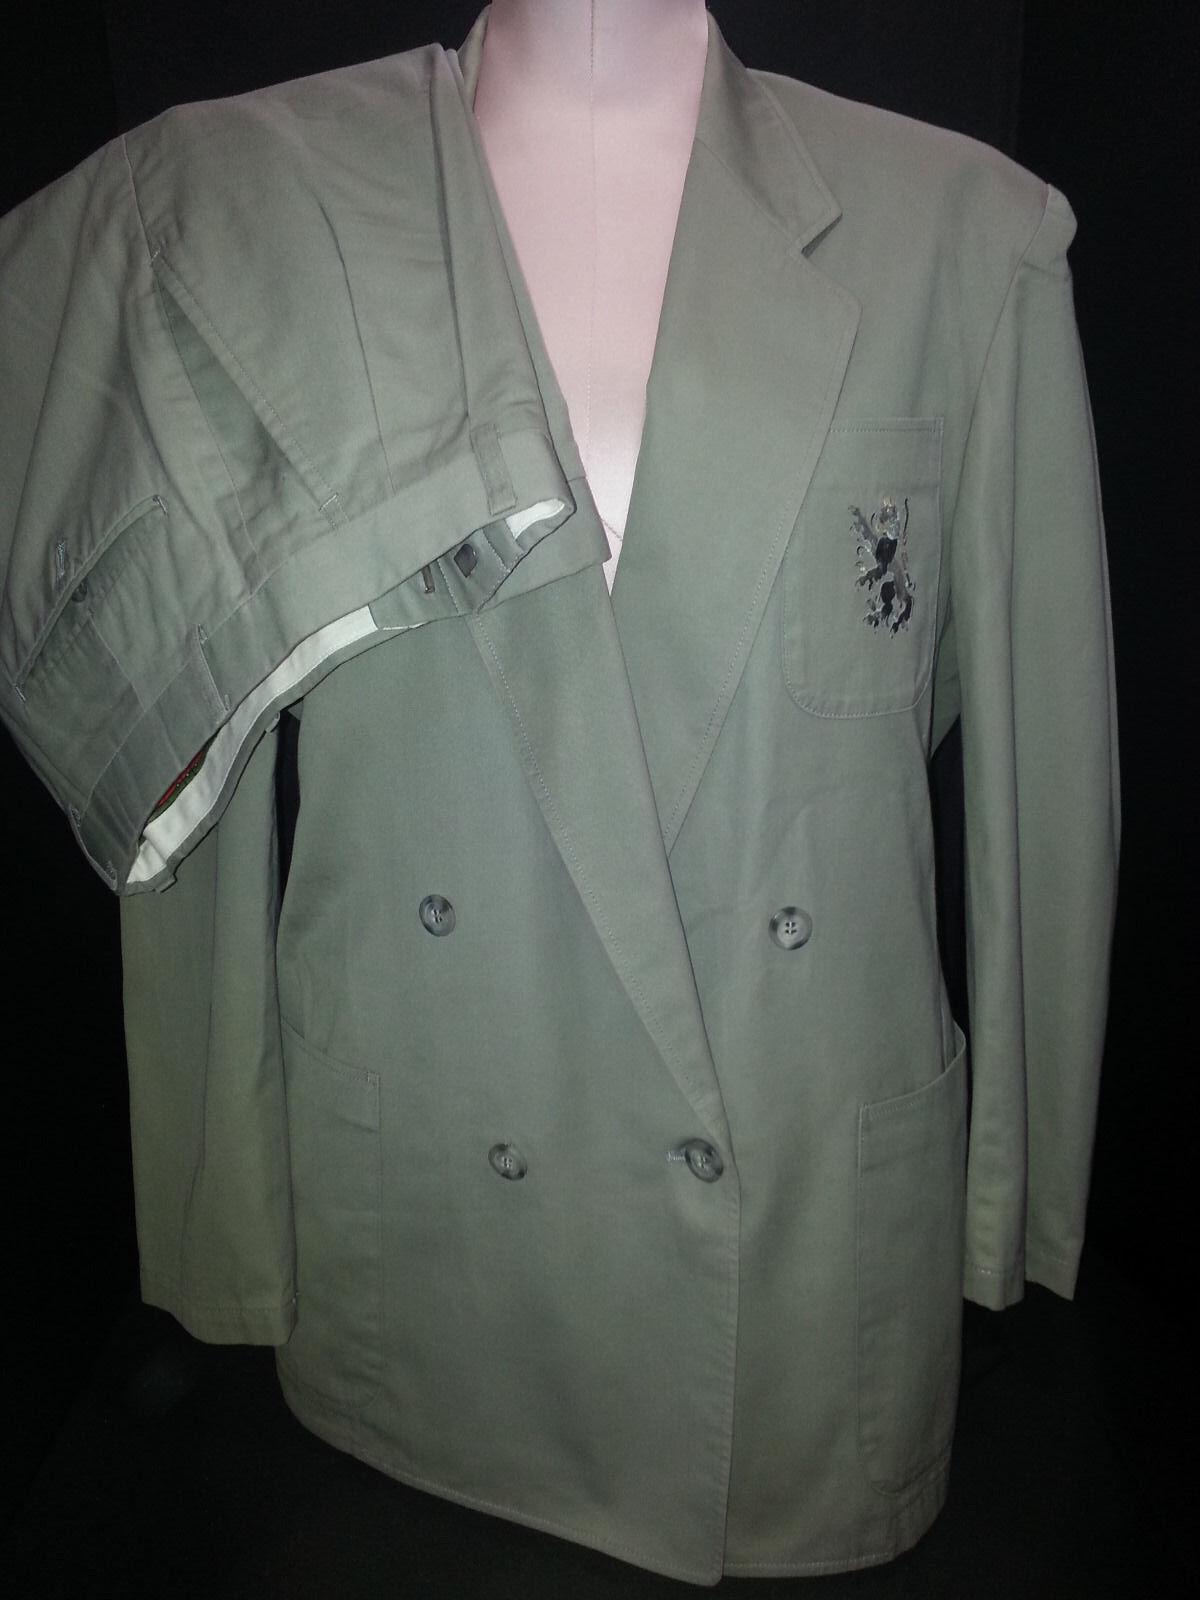 Vtg ROBERTA DE CAMERINO Pants Suit Double Breasted Blazer Size 12 Medium Green